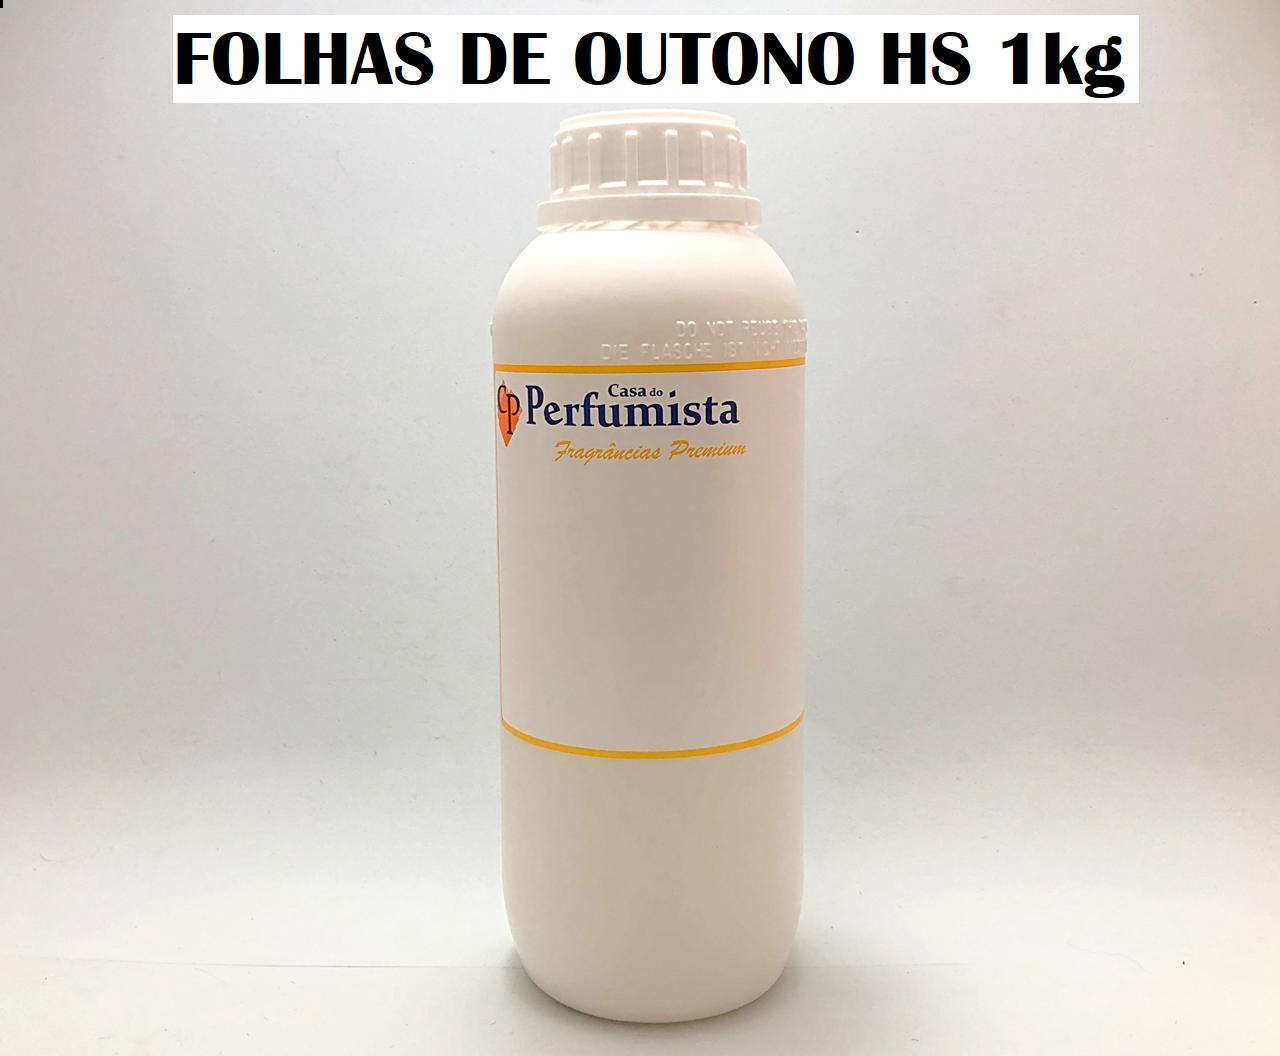 FOLHAS DE OUTONO HS - 1kg